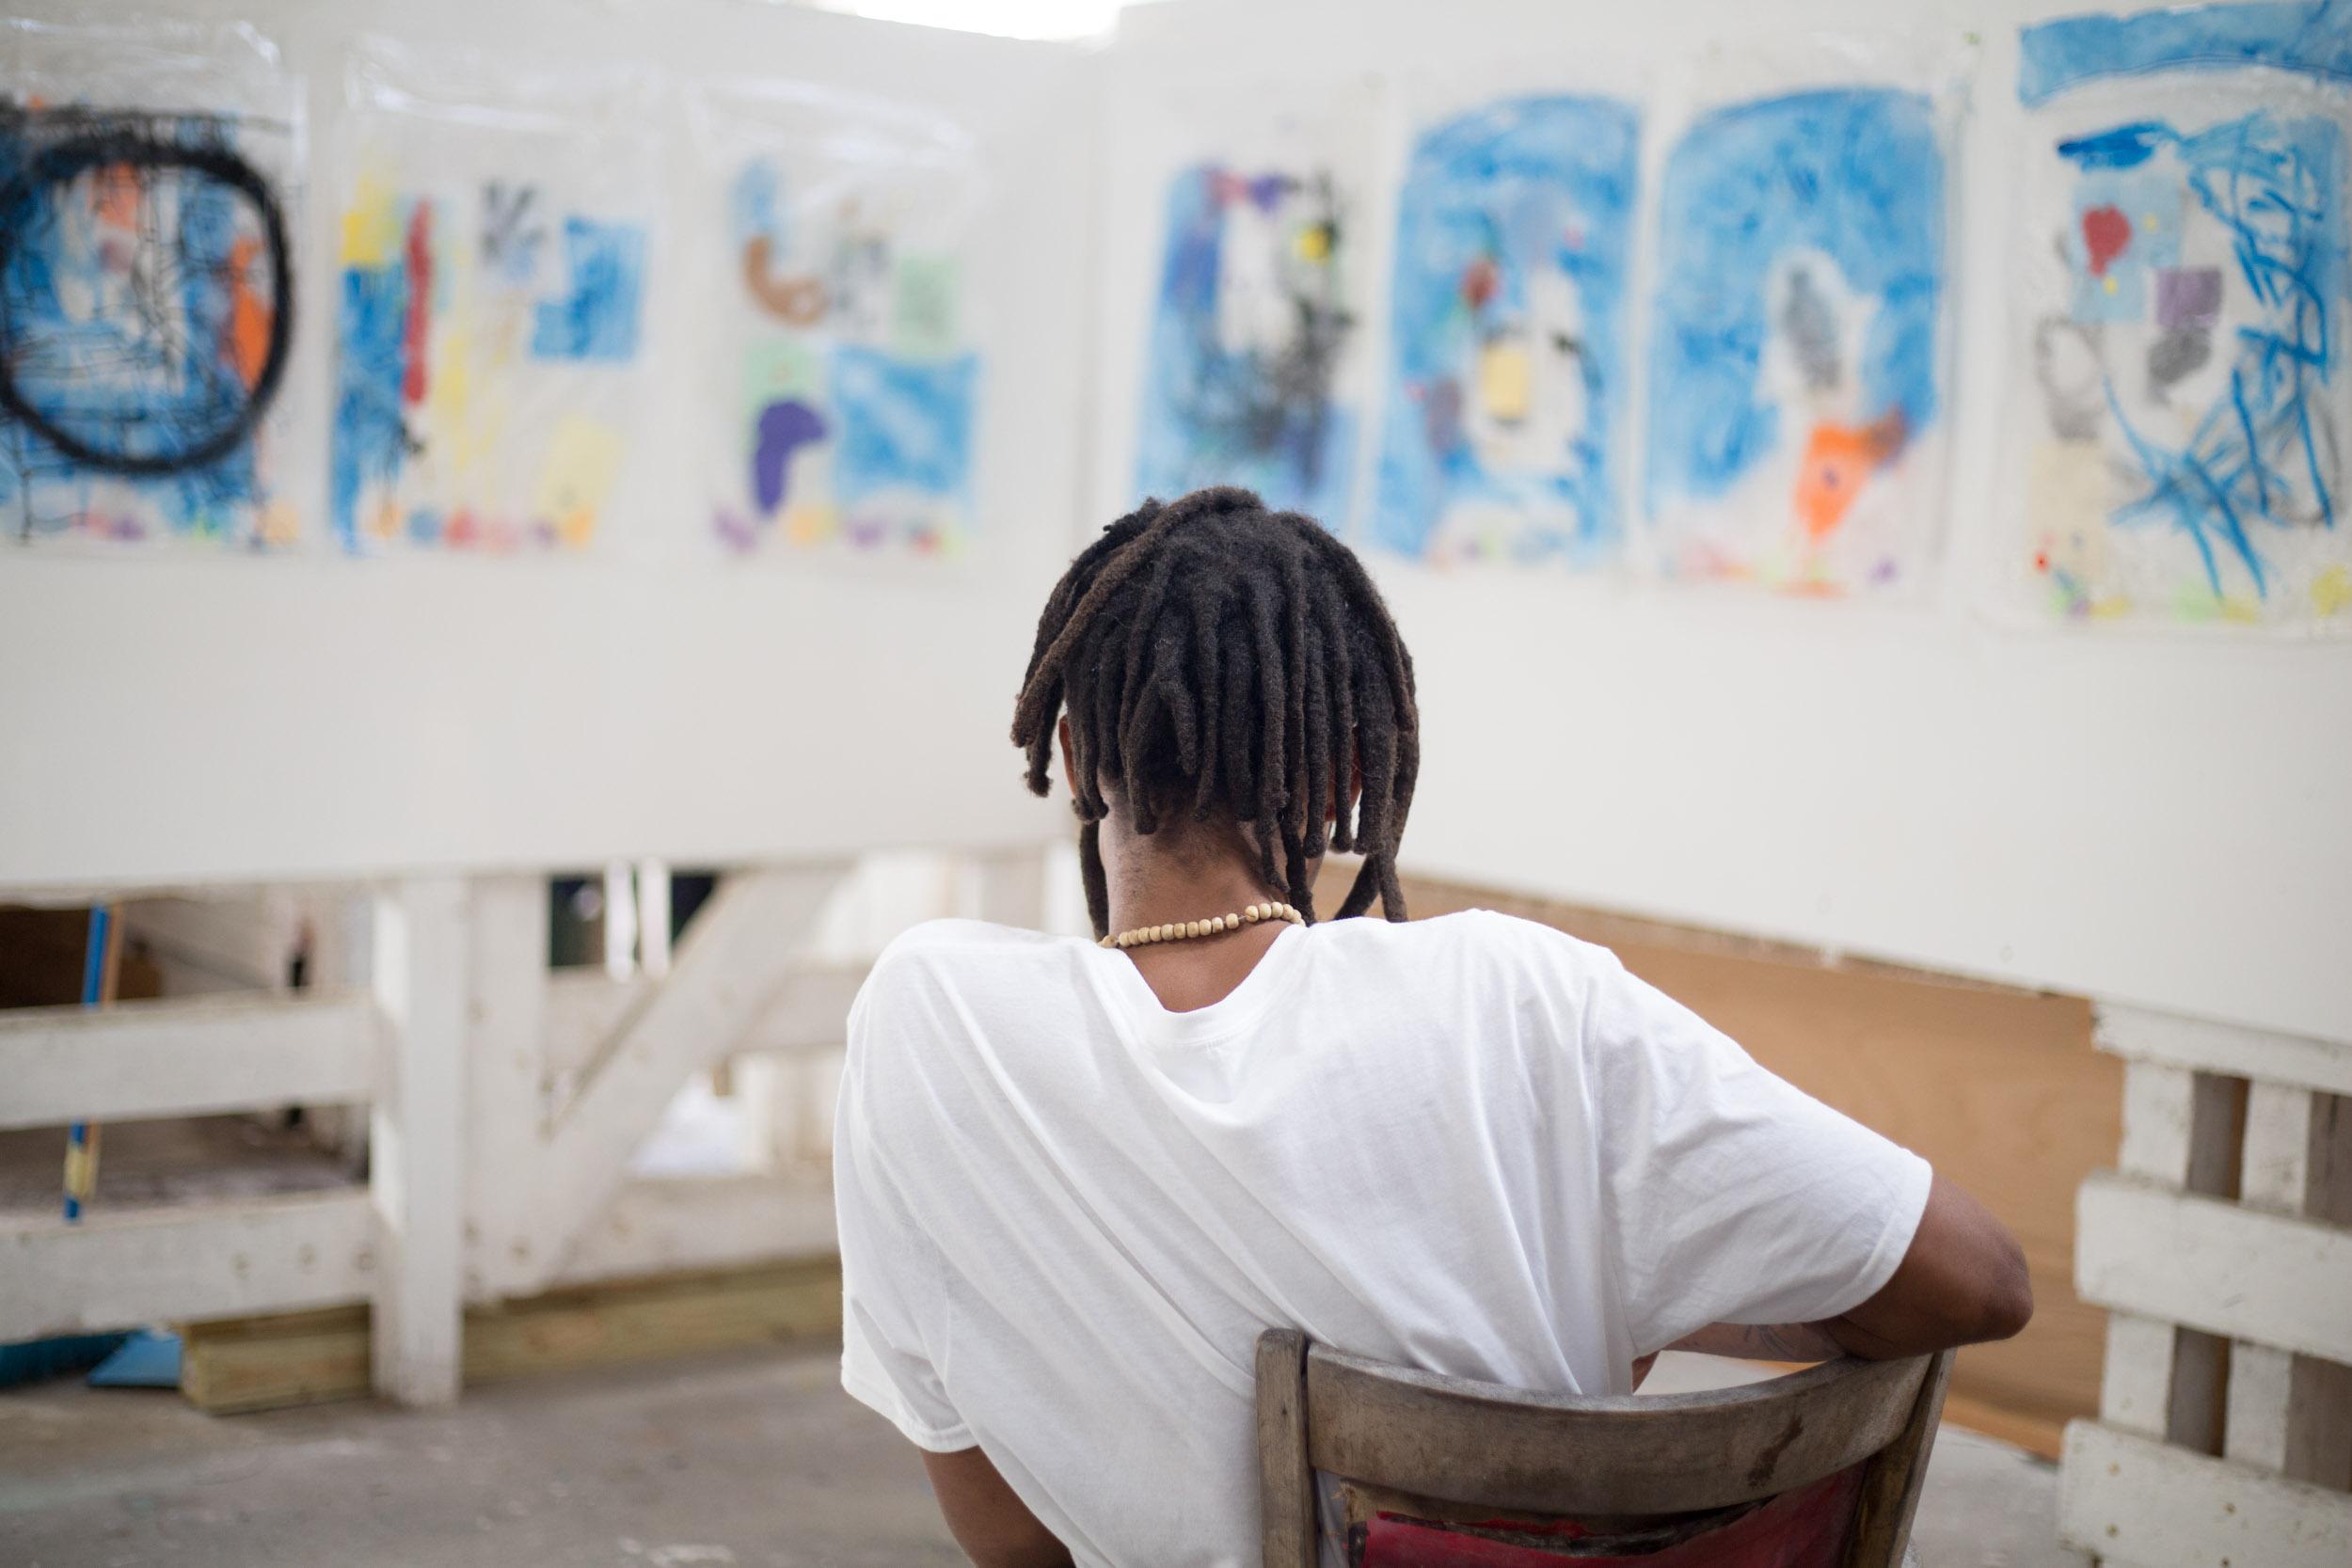 wassaic-project-artist-kwesi-abbensetts-2018-09-13-11-17-08.jpg